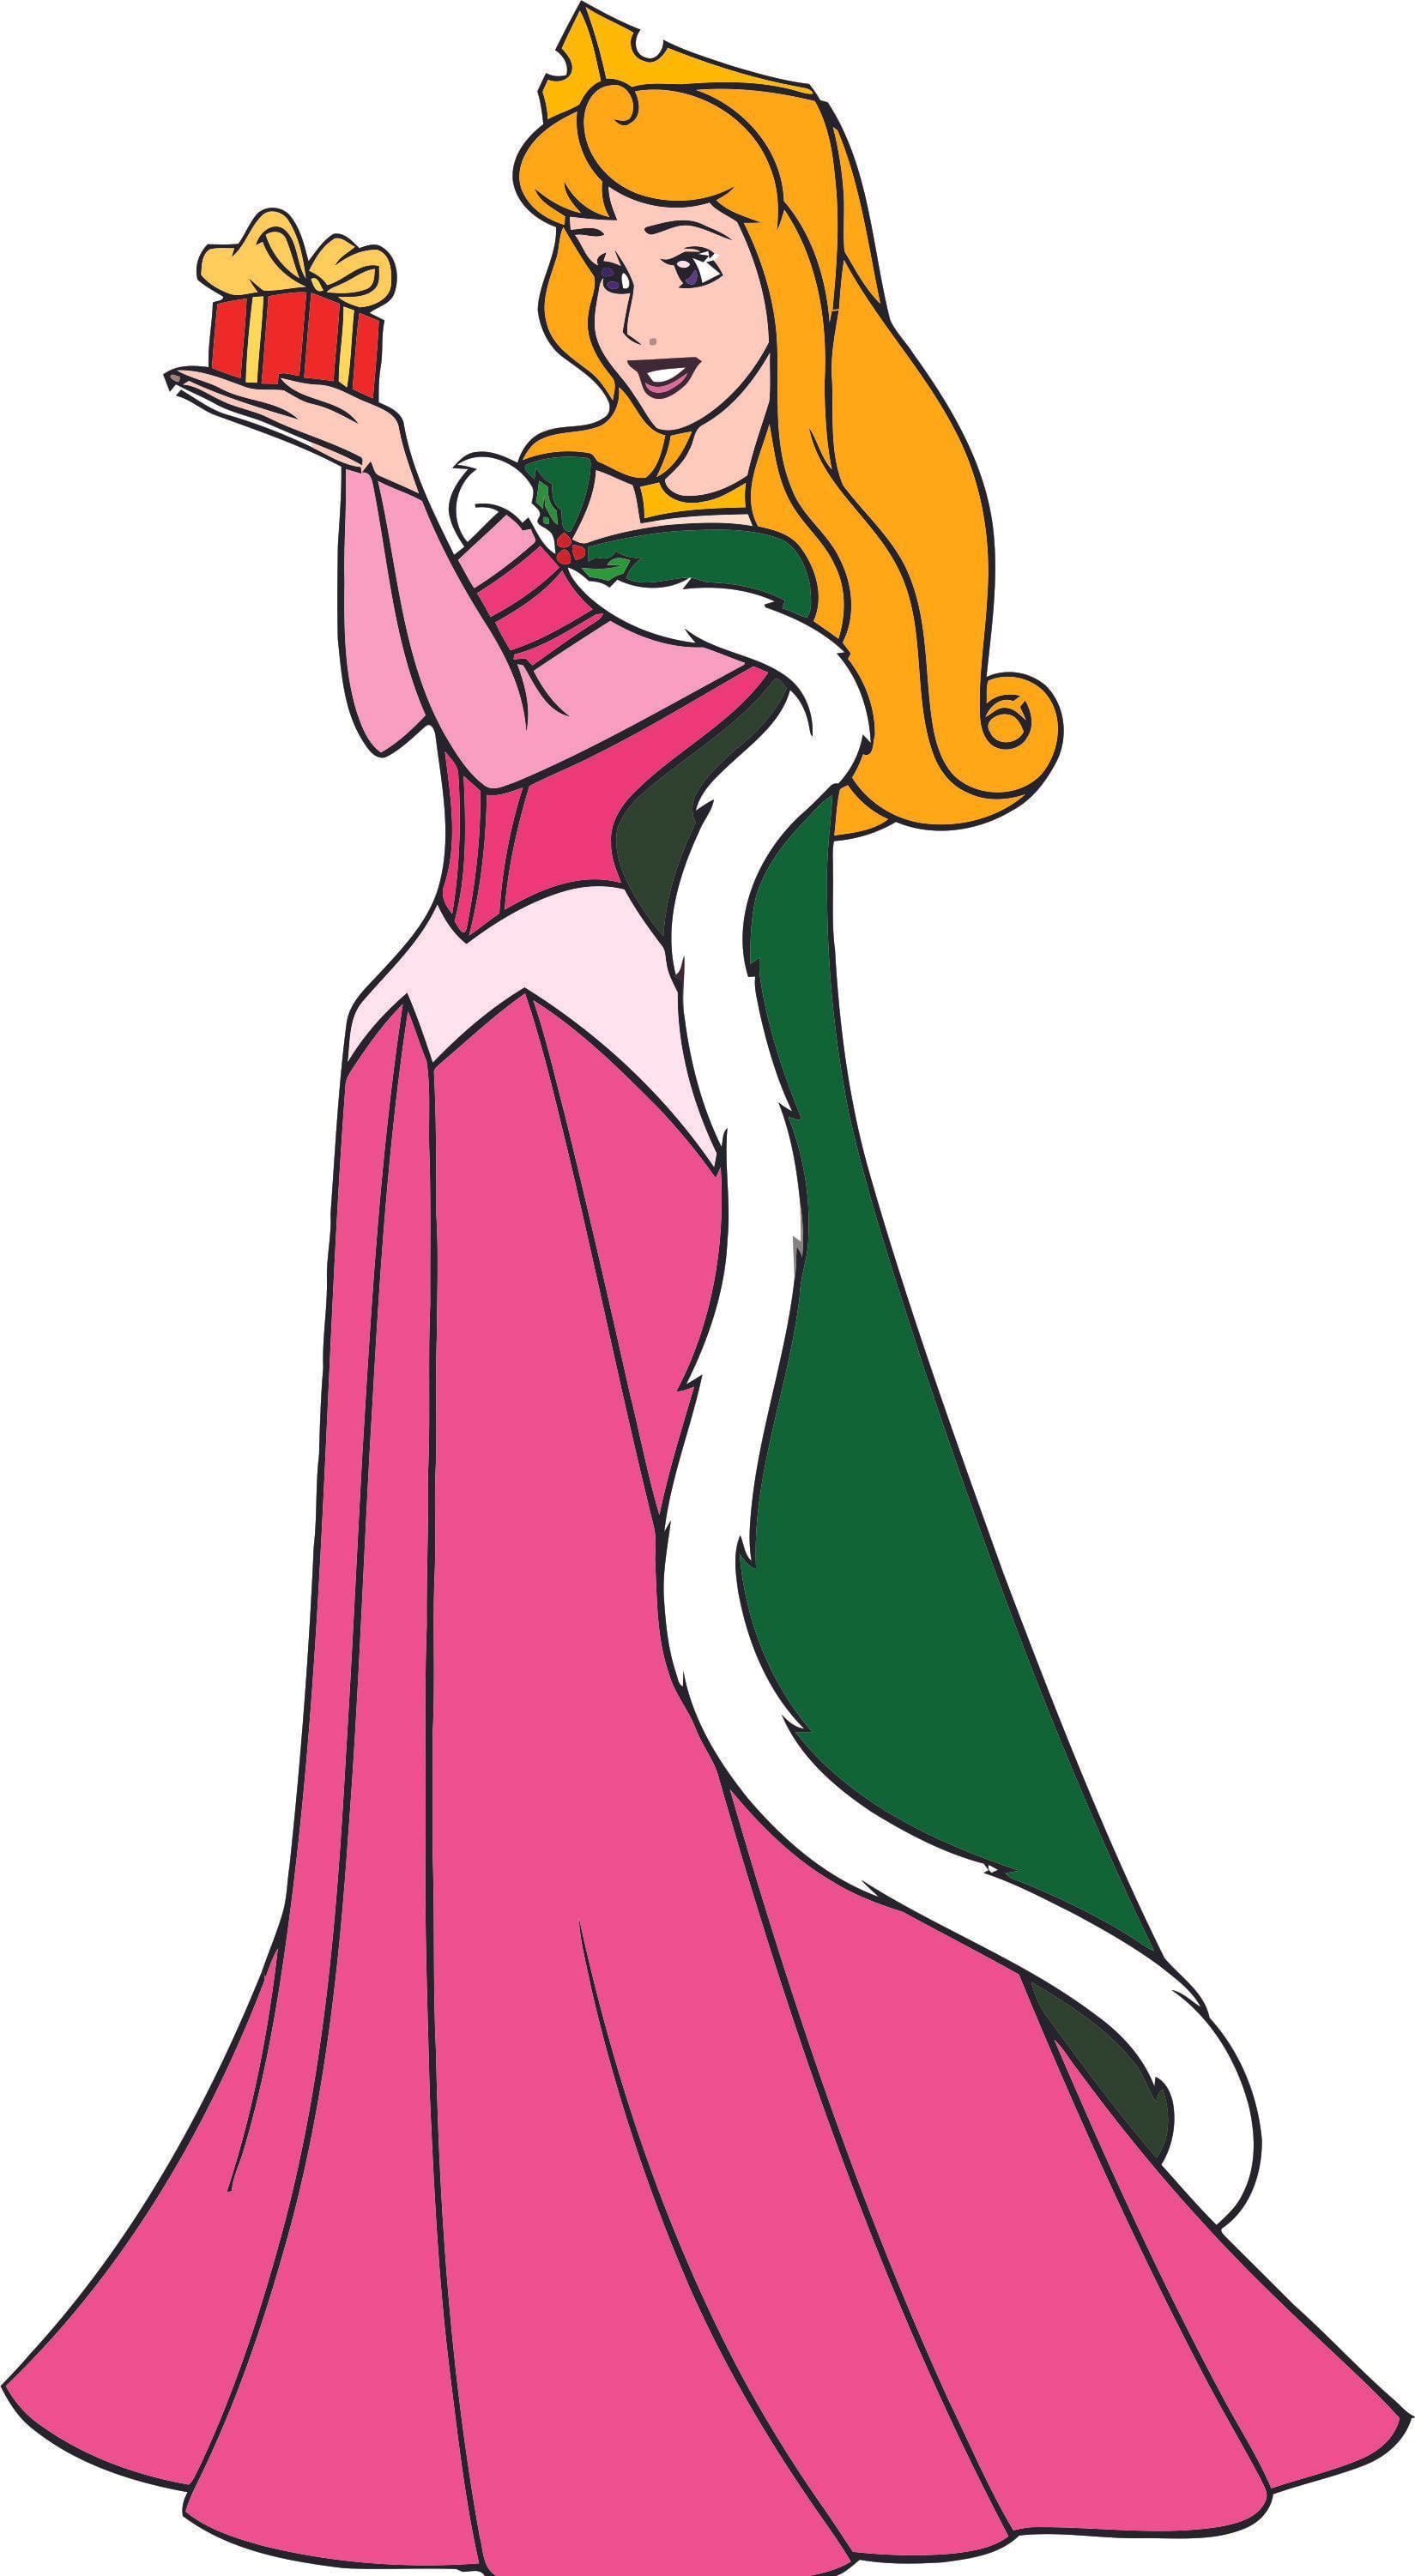 Princess Aurora Disney Princess Princesses Girl Girls Wall Decals